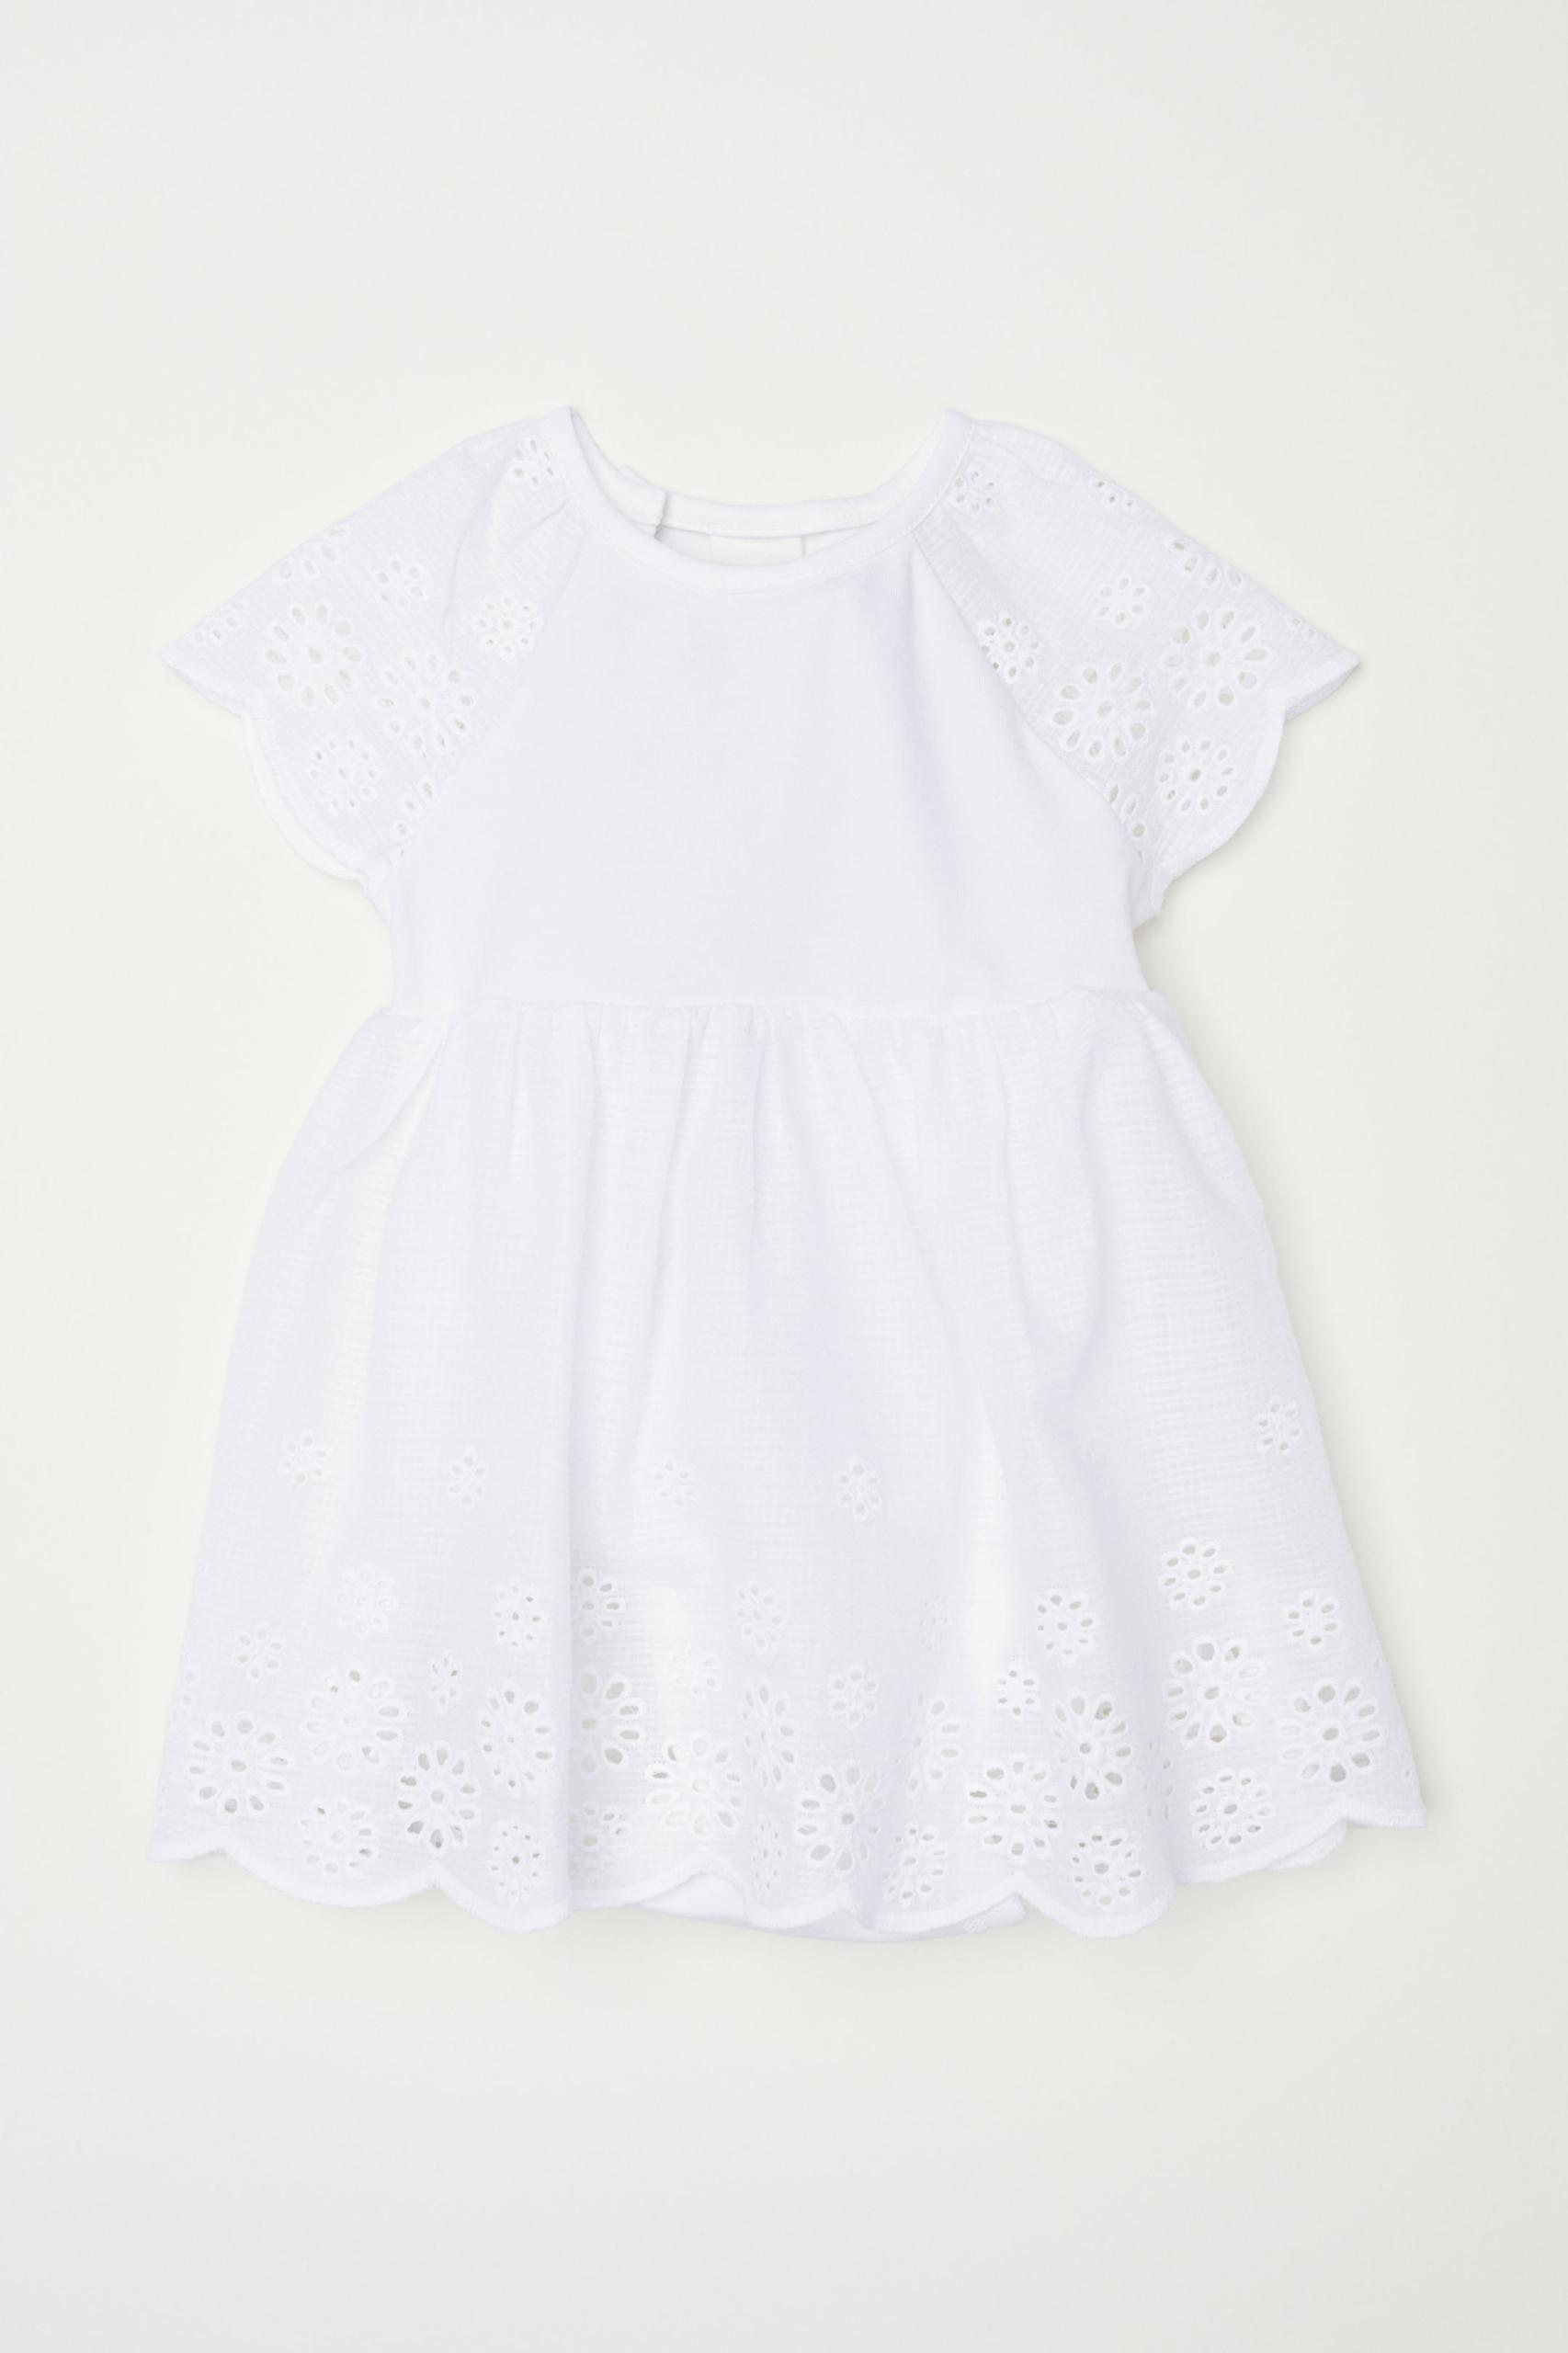 2029d4a56b Body Sukienki H M 62 okazja lato 2018 - 7465743731 - oficjalne ...